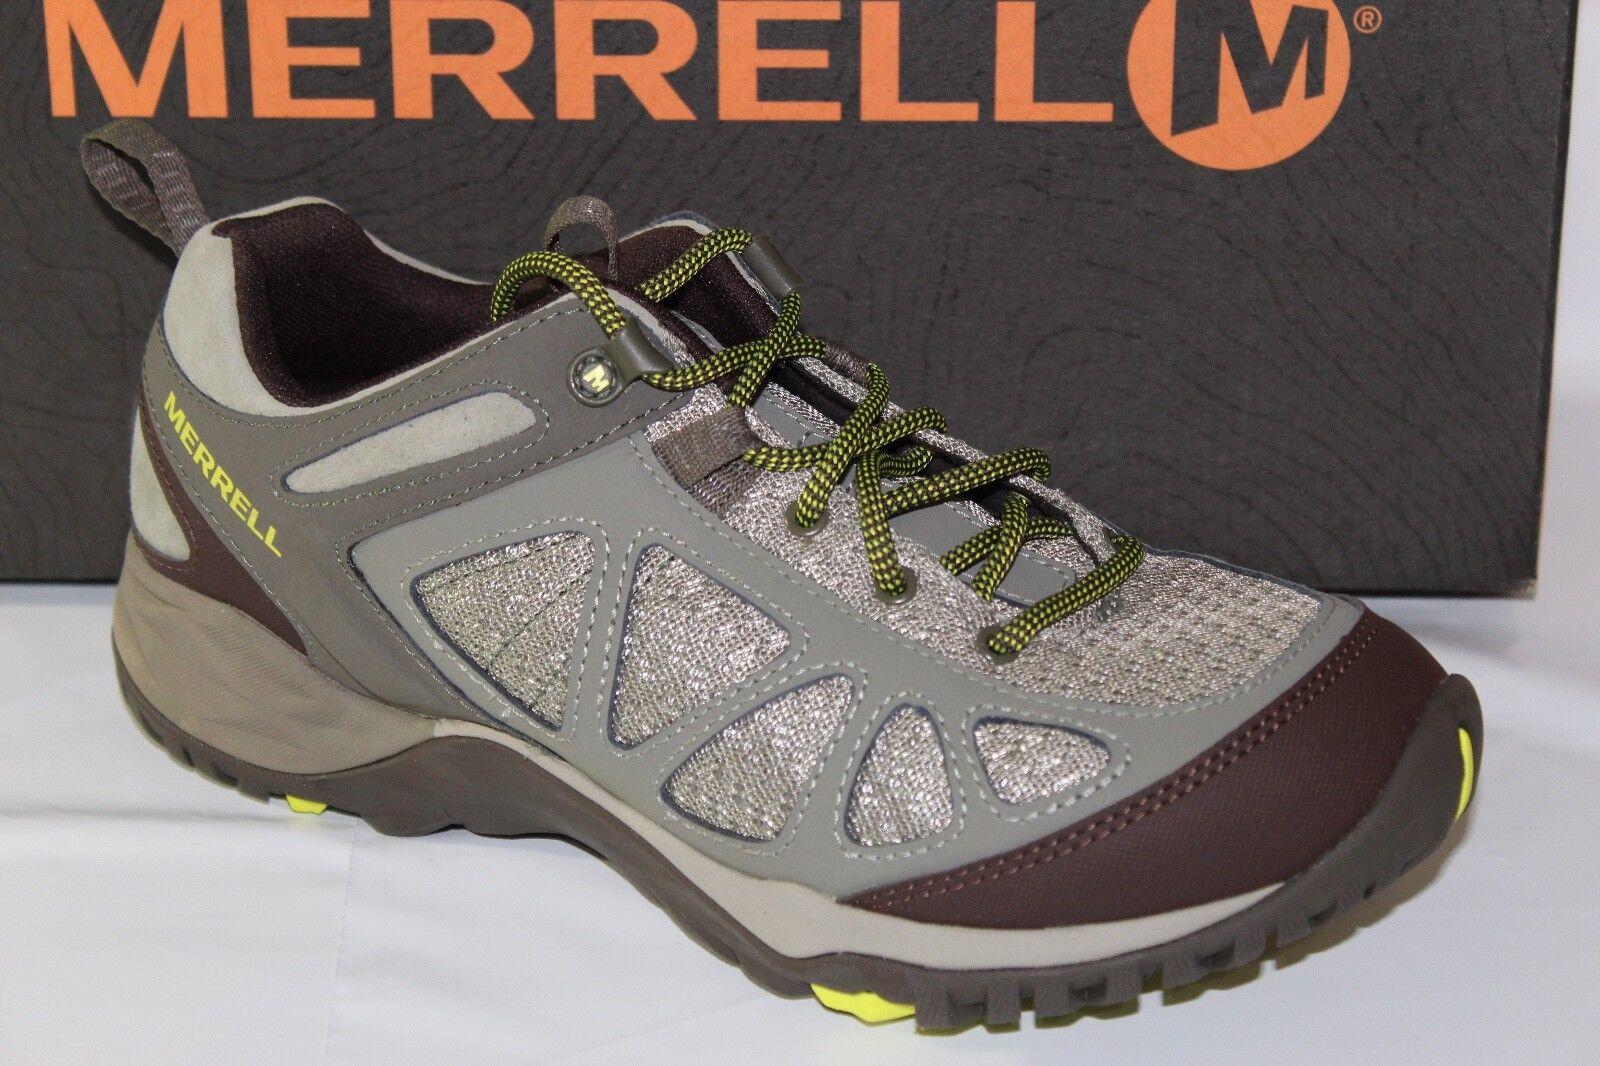 MERRELL MERRELL MERRELL SIREN SPORT Q2 donna HIKING scarpe, DimensioneS  9 & 9.5, DUSTY OLIVE, J37464 105953